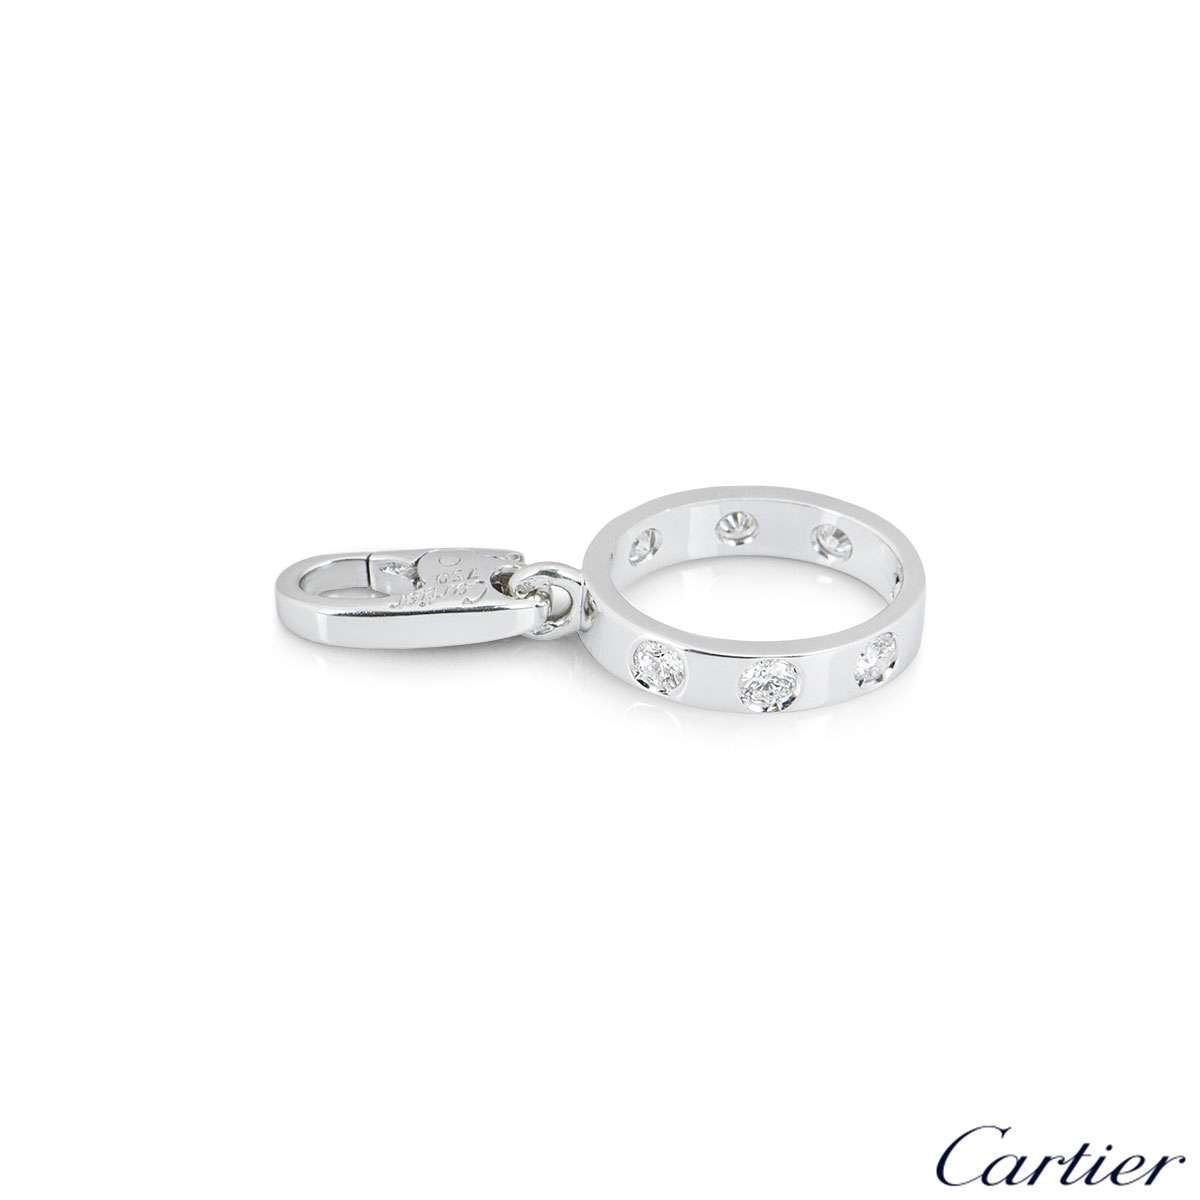 Cartier White Gold Diamond Love Charm